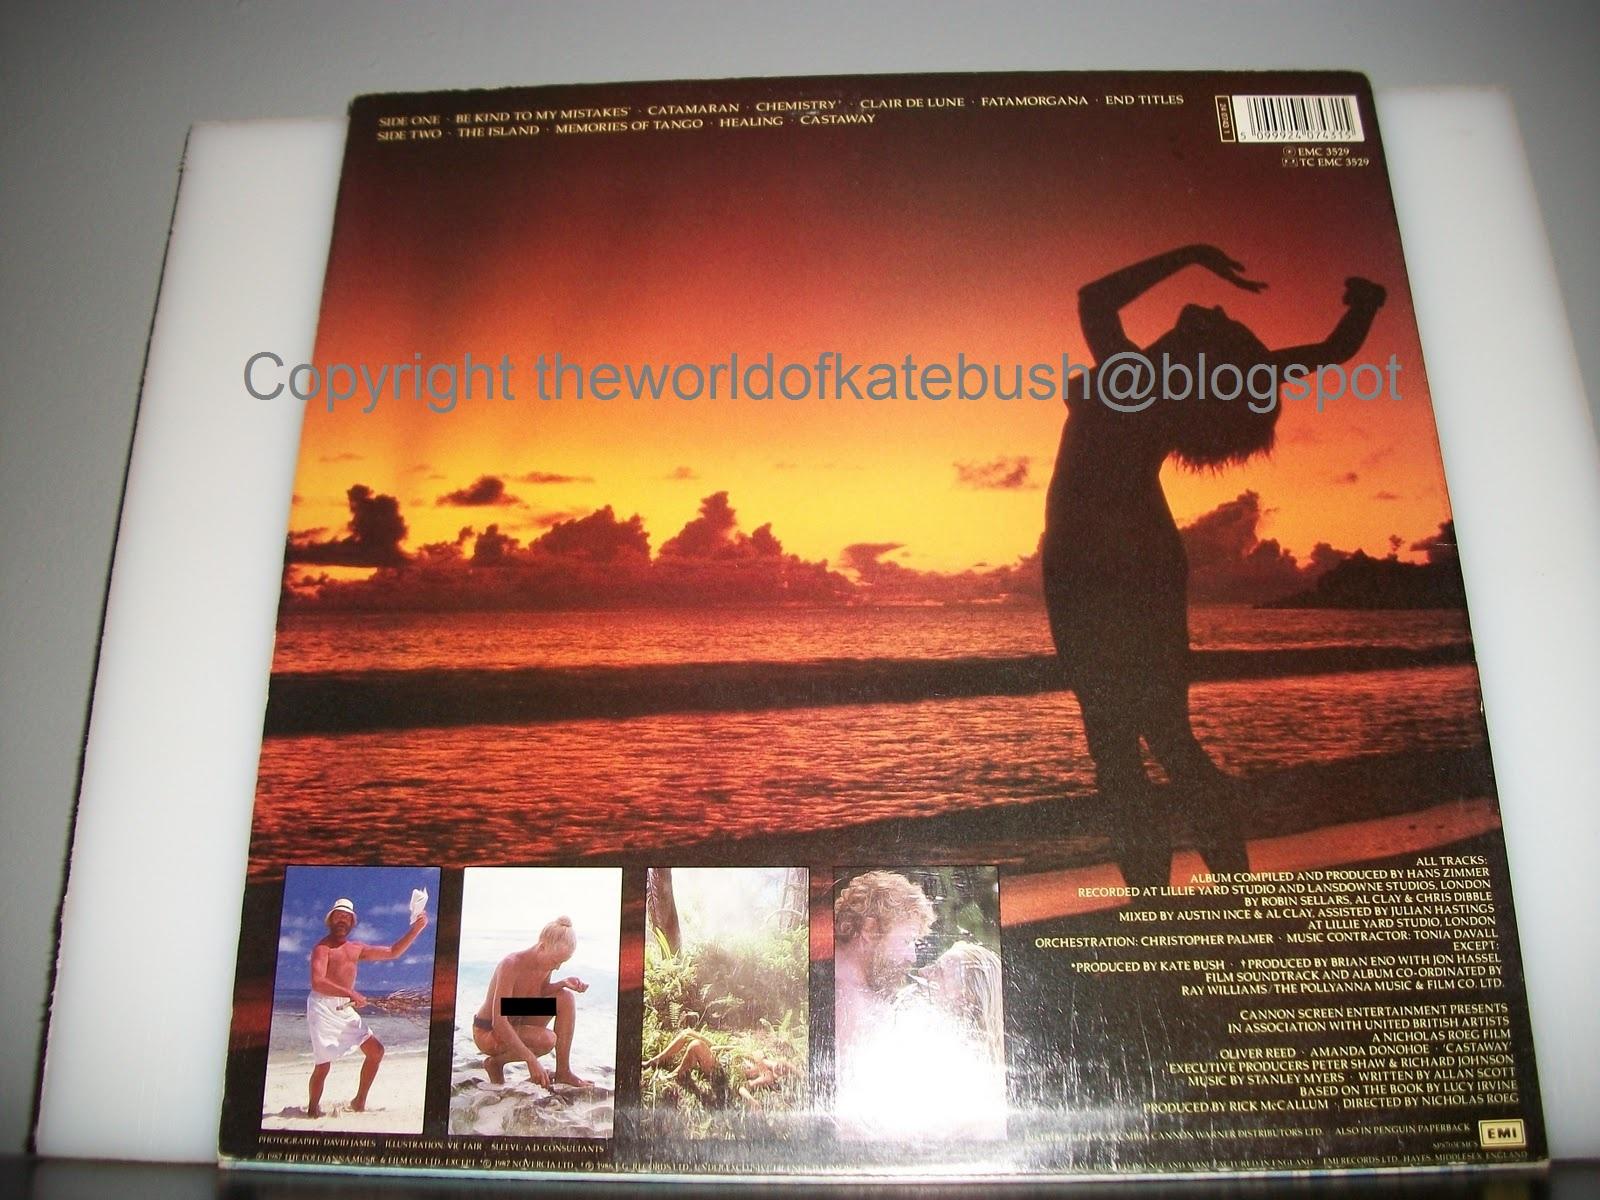 THE WORLD OF KATE BUSH: Castaway - Original Film Soundtrack (LP)